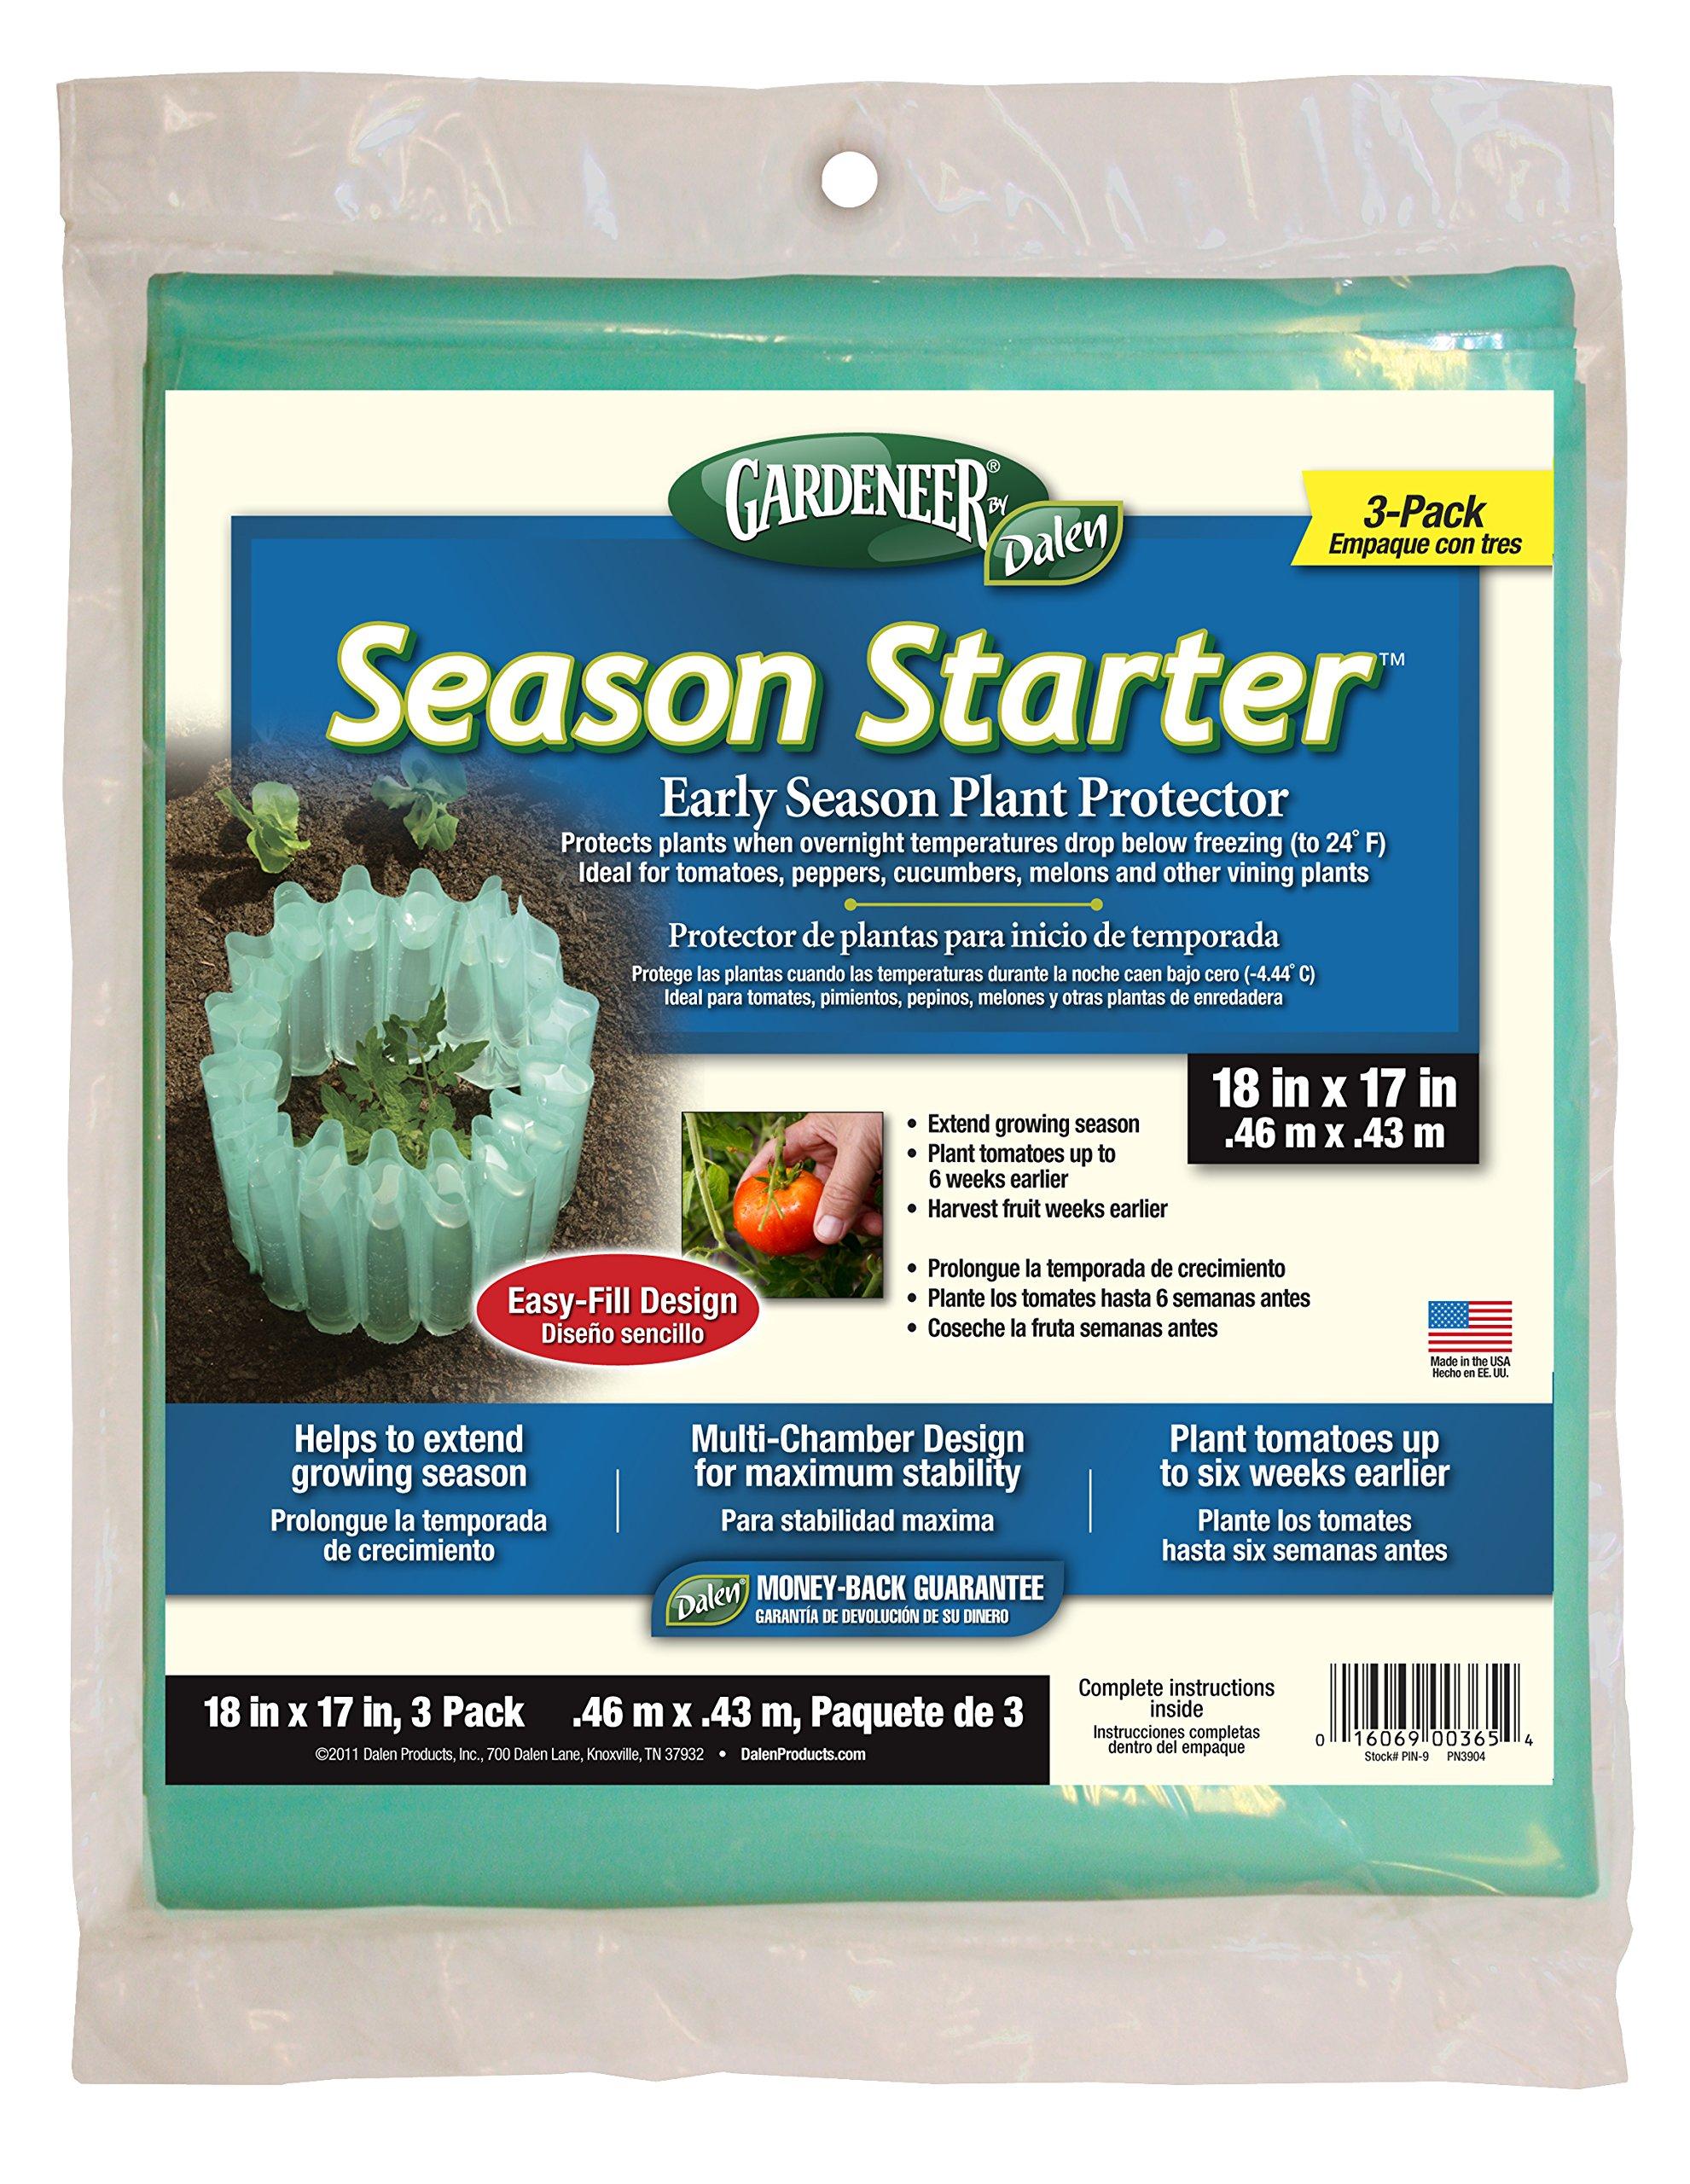 Dalen Gardeneer By Season Starter Early Season Plant Protector 18'' x 17'' (3 Pack)